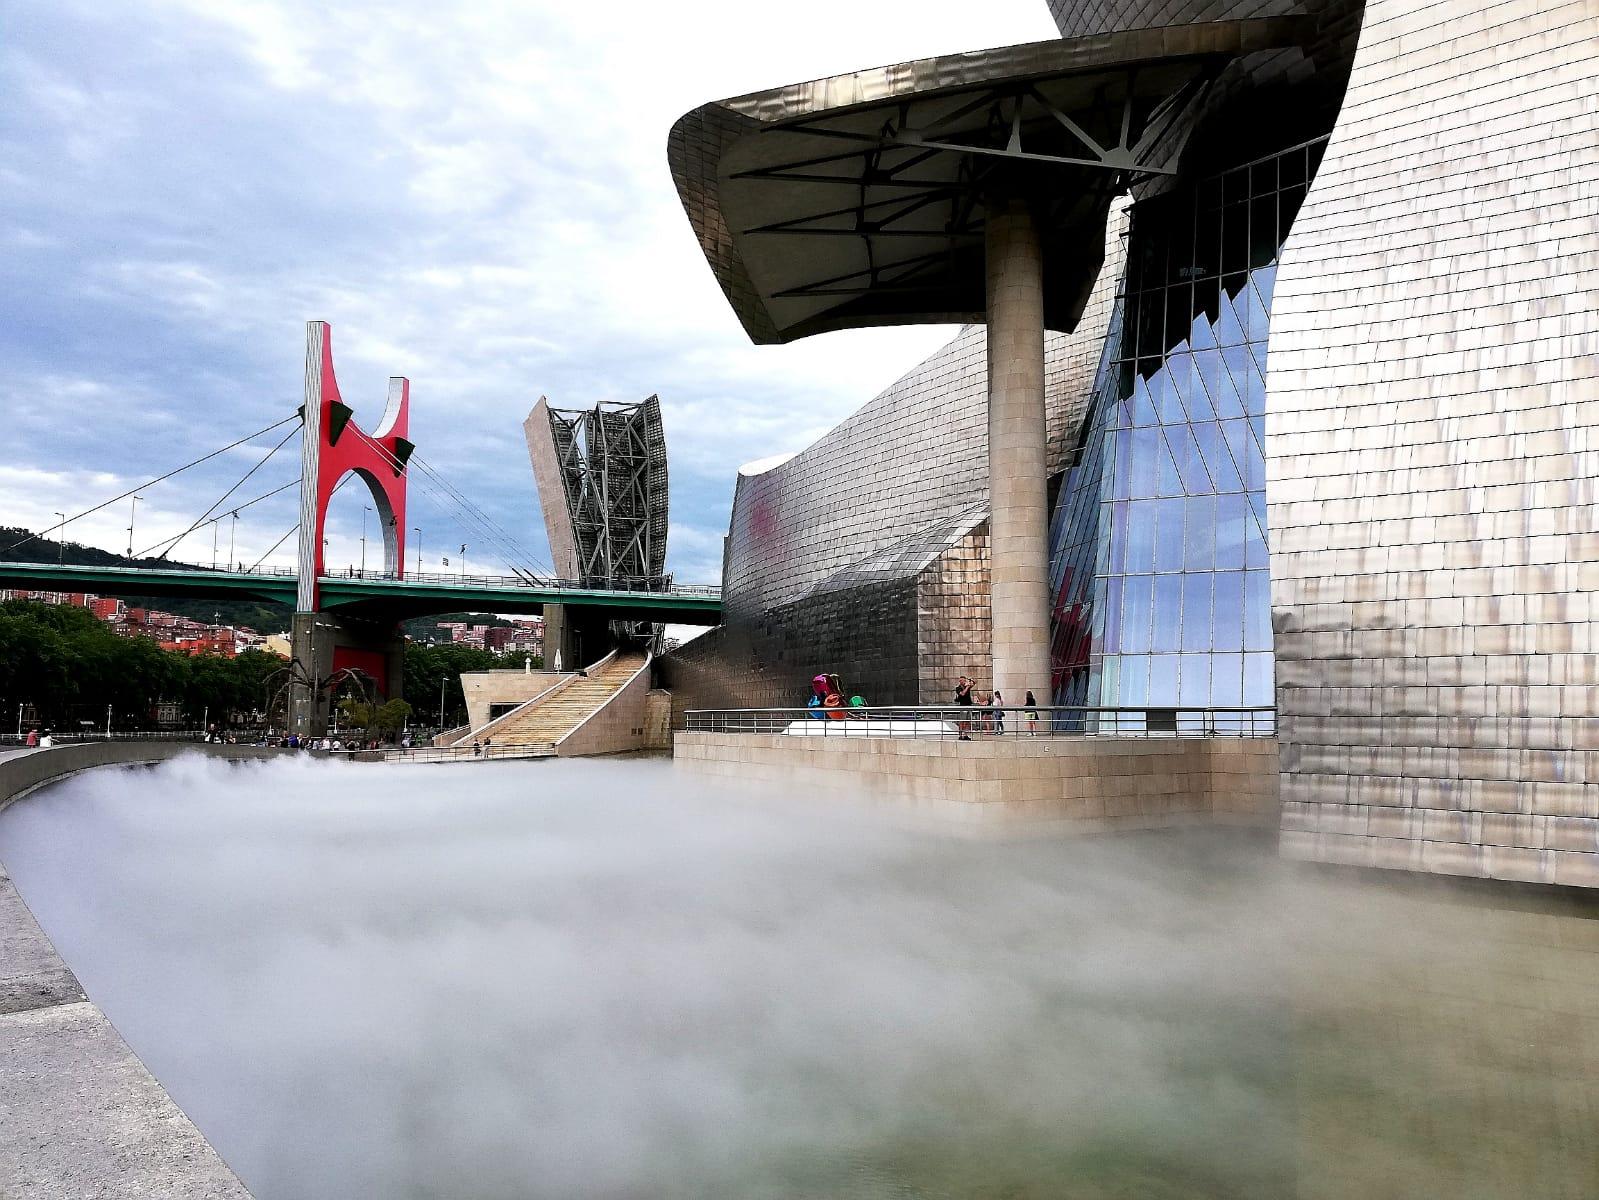 Museo Guggenheim (Bilbao), pro Miguel A. Bermejo Parra